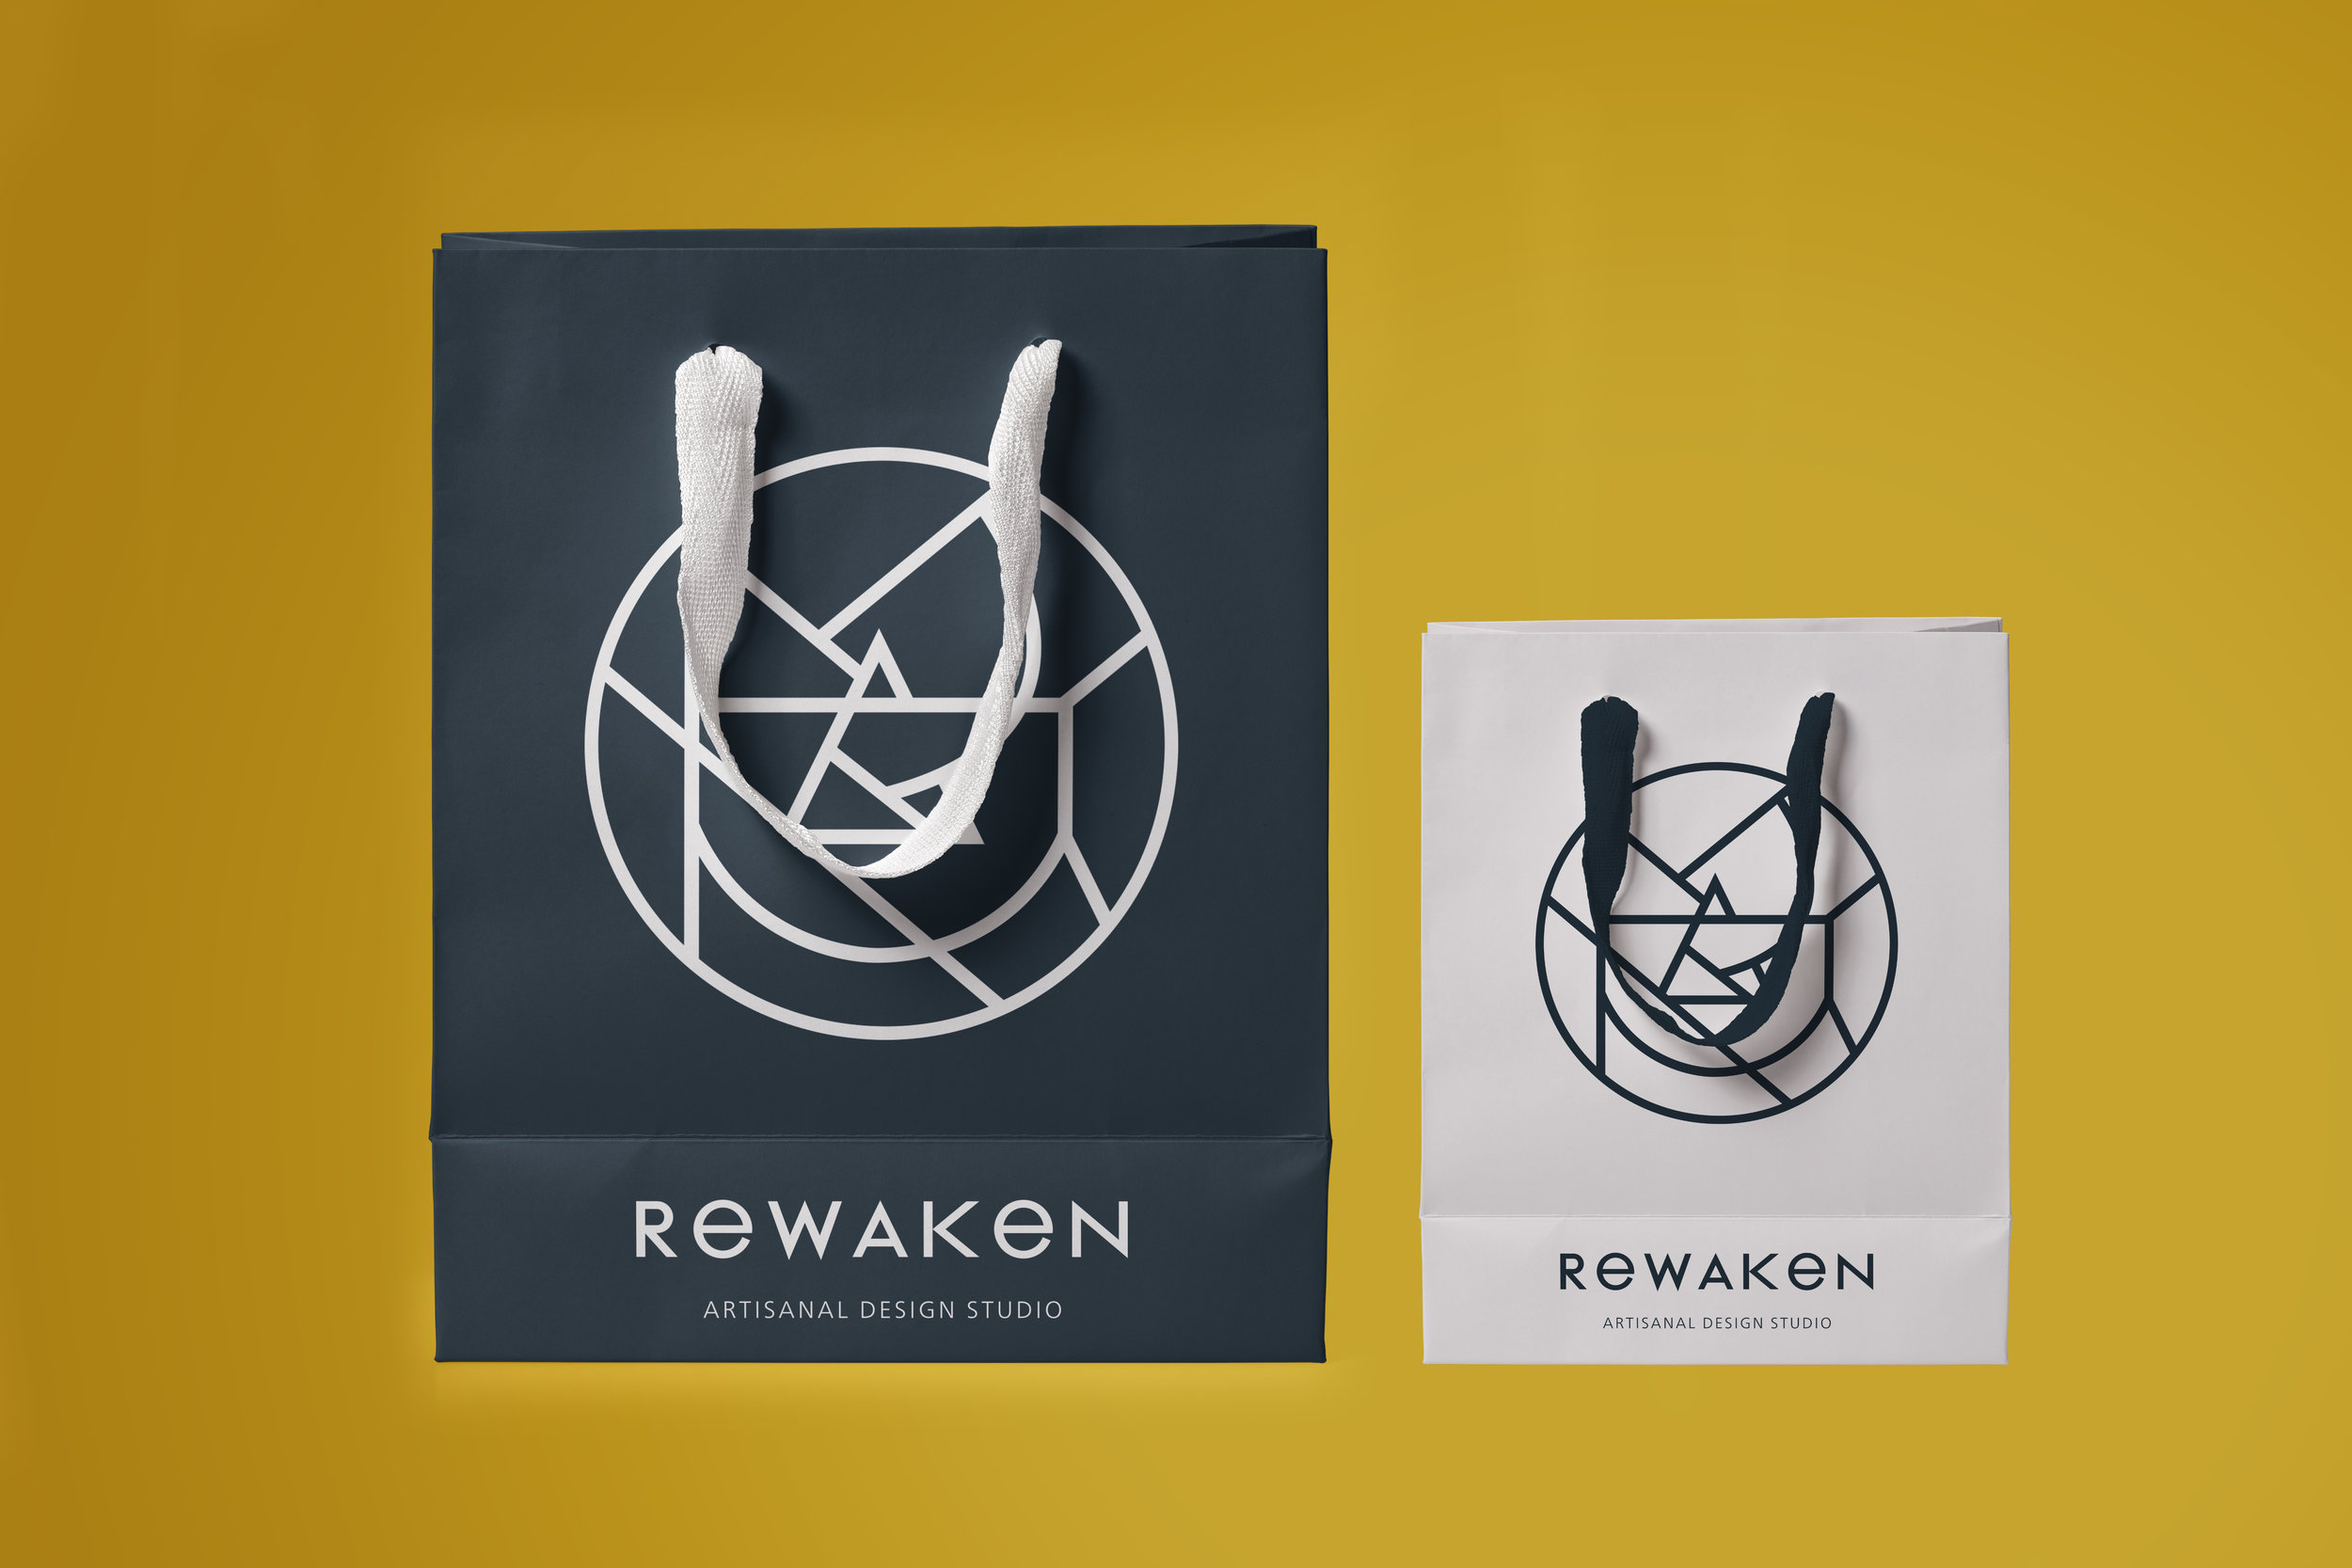 rewaken_mockup_5.jpg